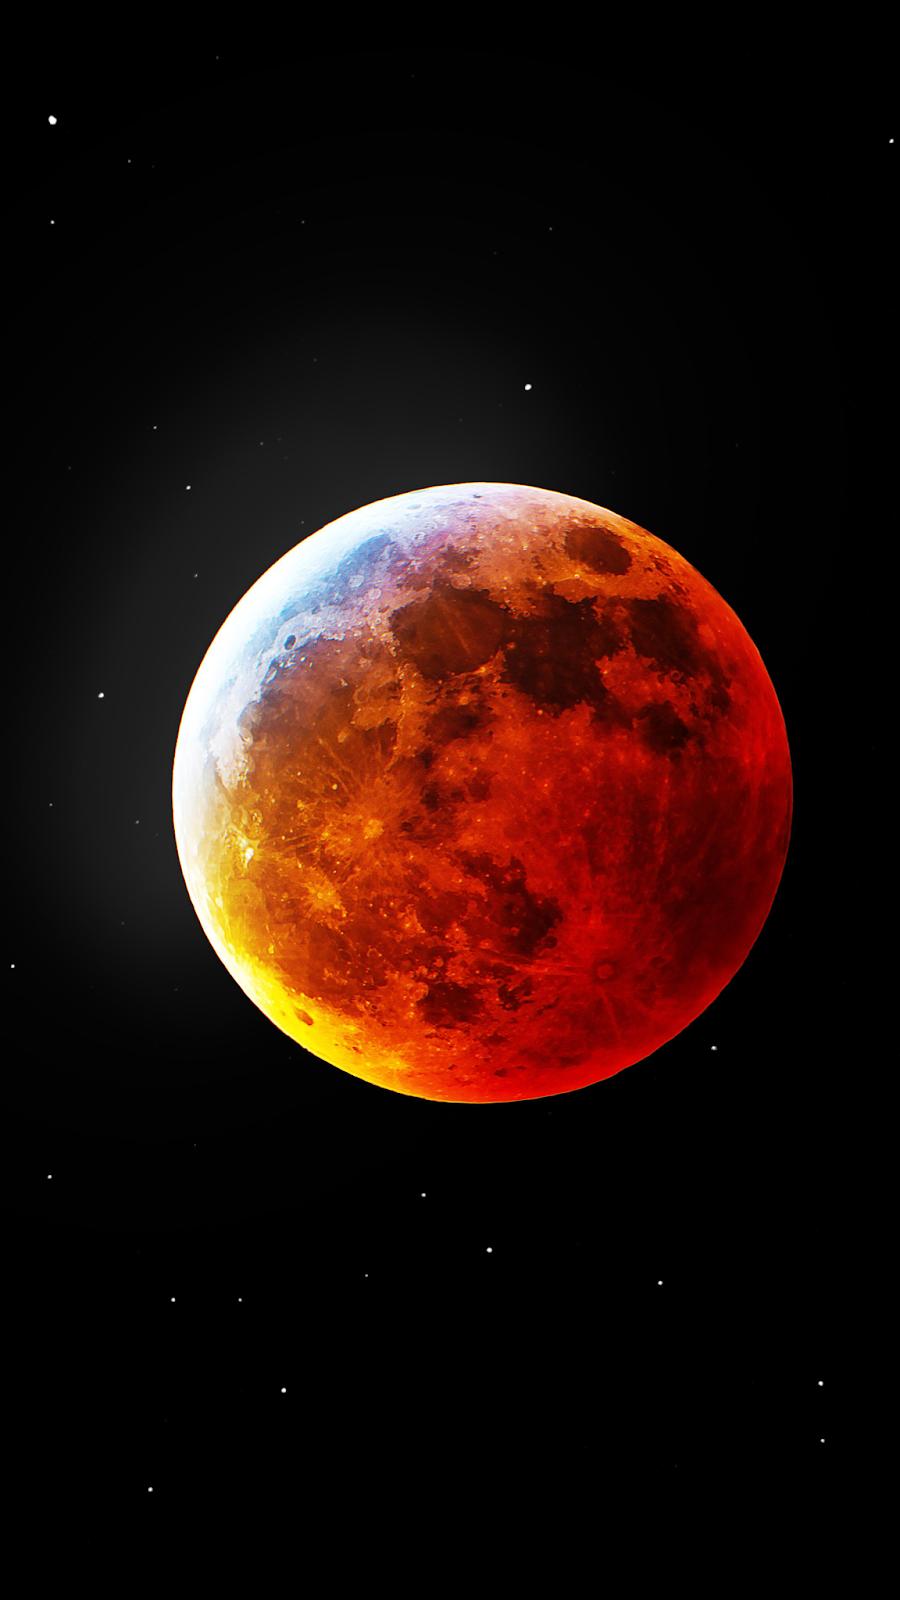 Super full moon - #full #moon, #Super | Full hd wallpaper ...